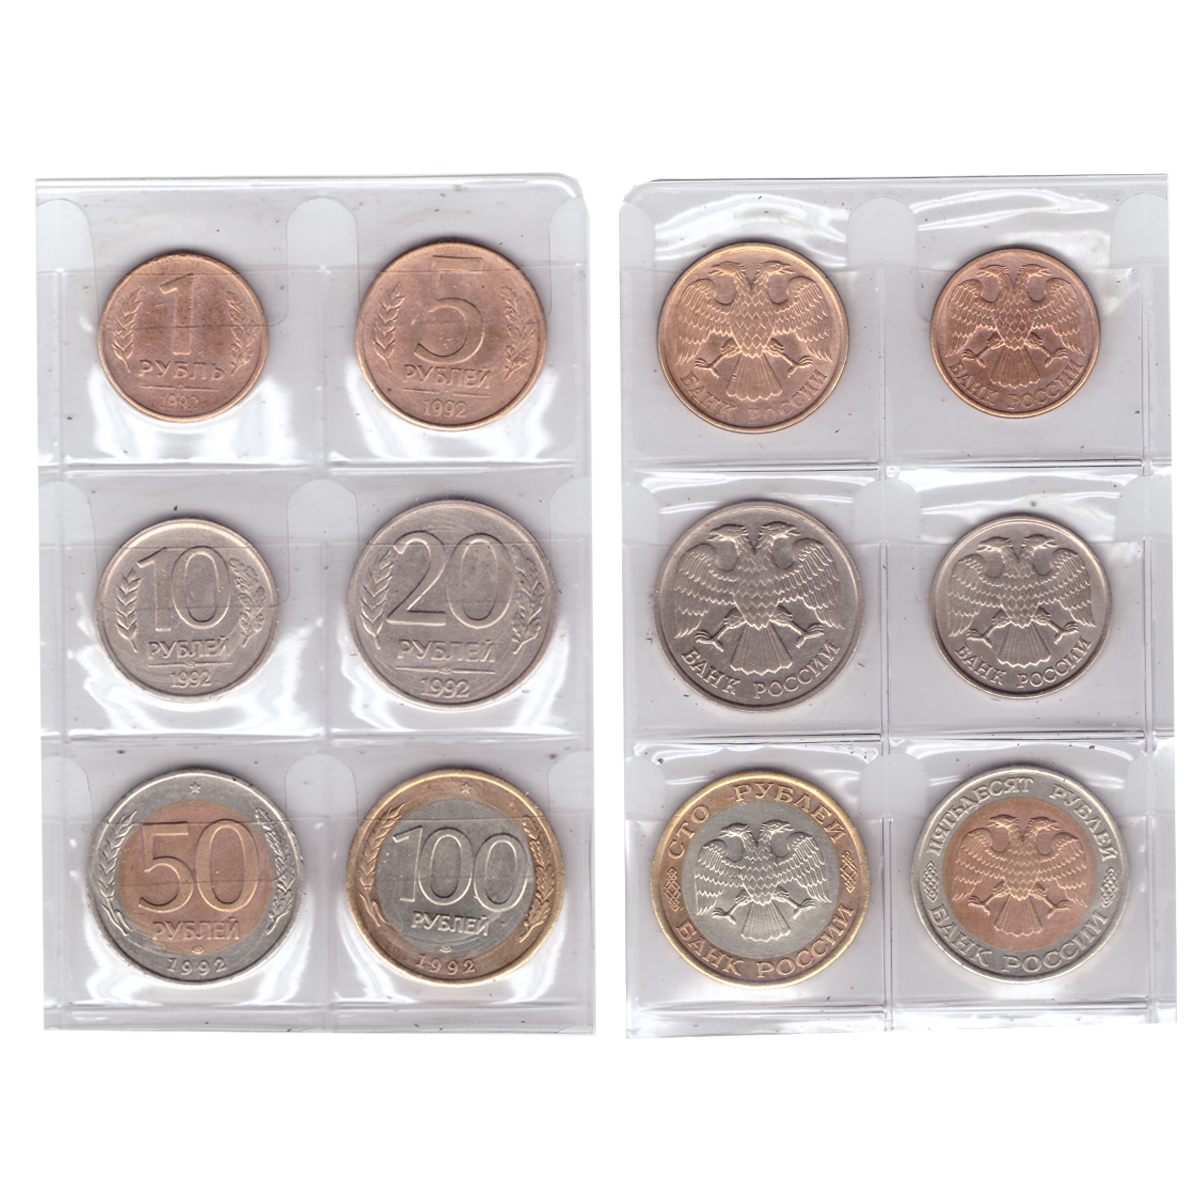 Годовой набор монет 1992 года (л/лмд) 1р.,5р.,10р.,20р.,50р.,100р. VF